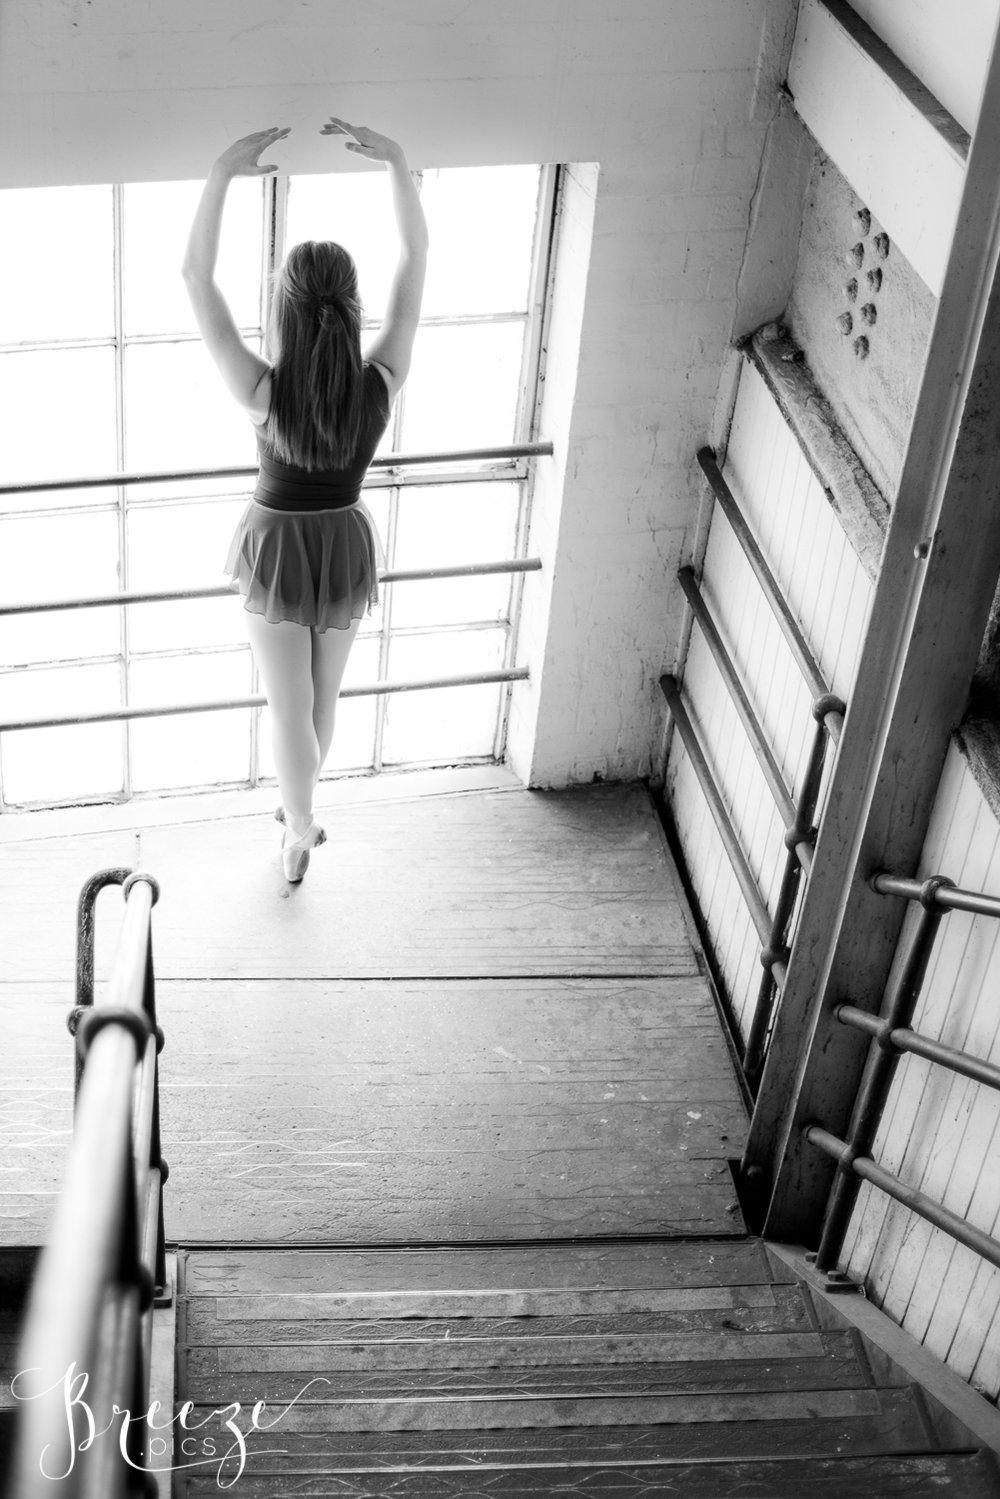 Dance_Bernadette_Meyers-5718-Edit.jpg